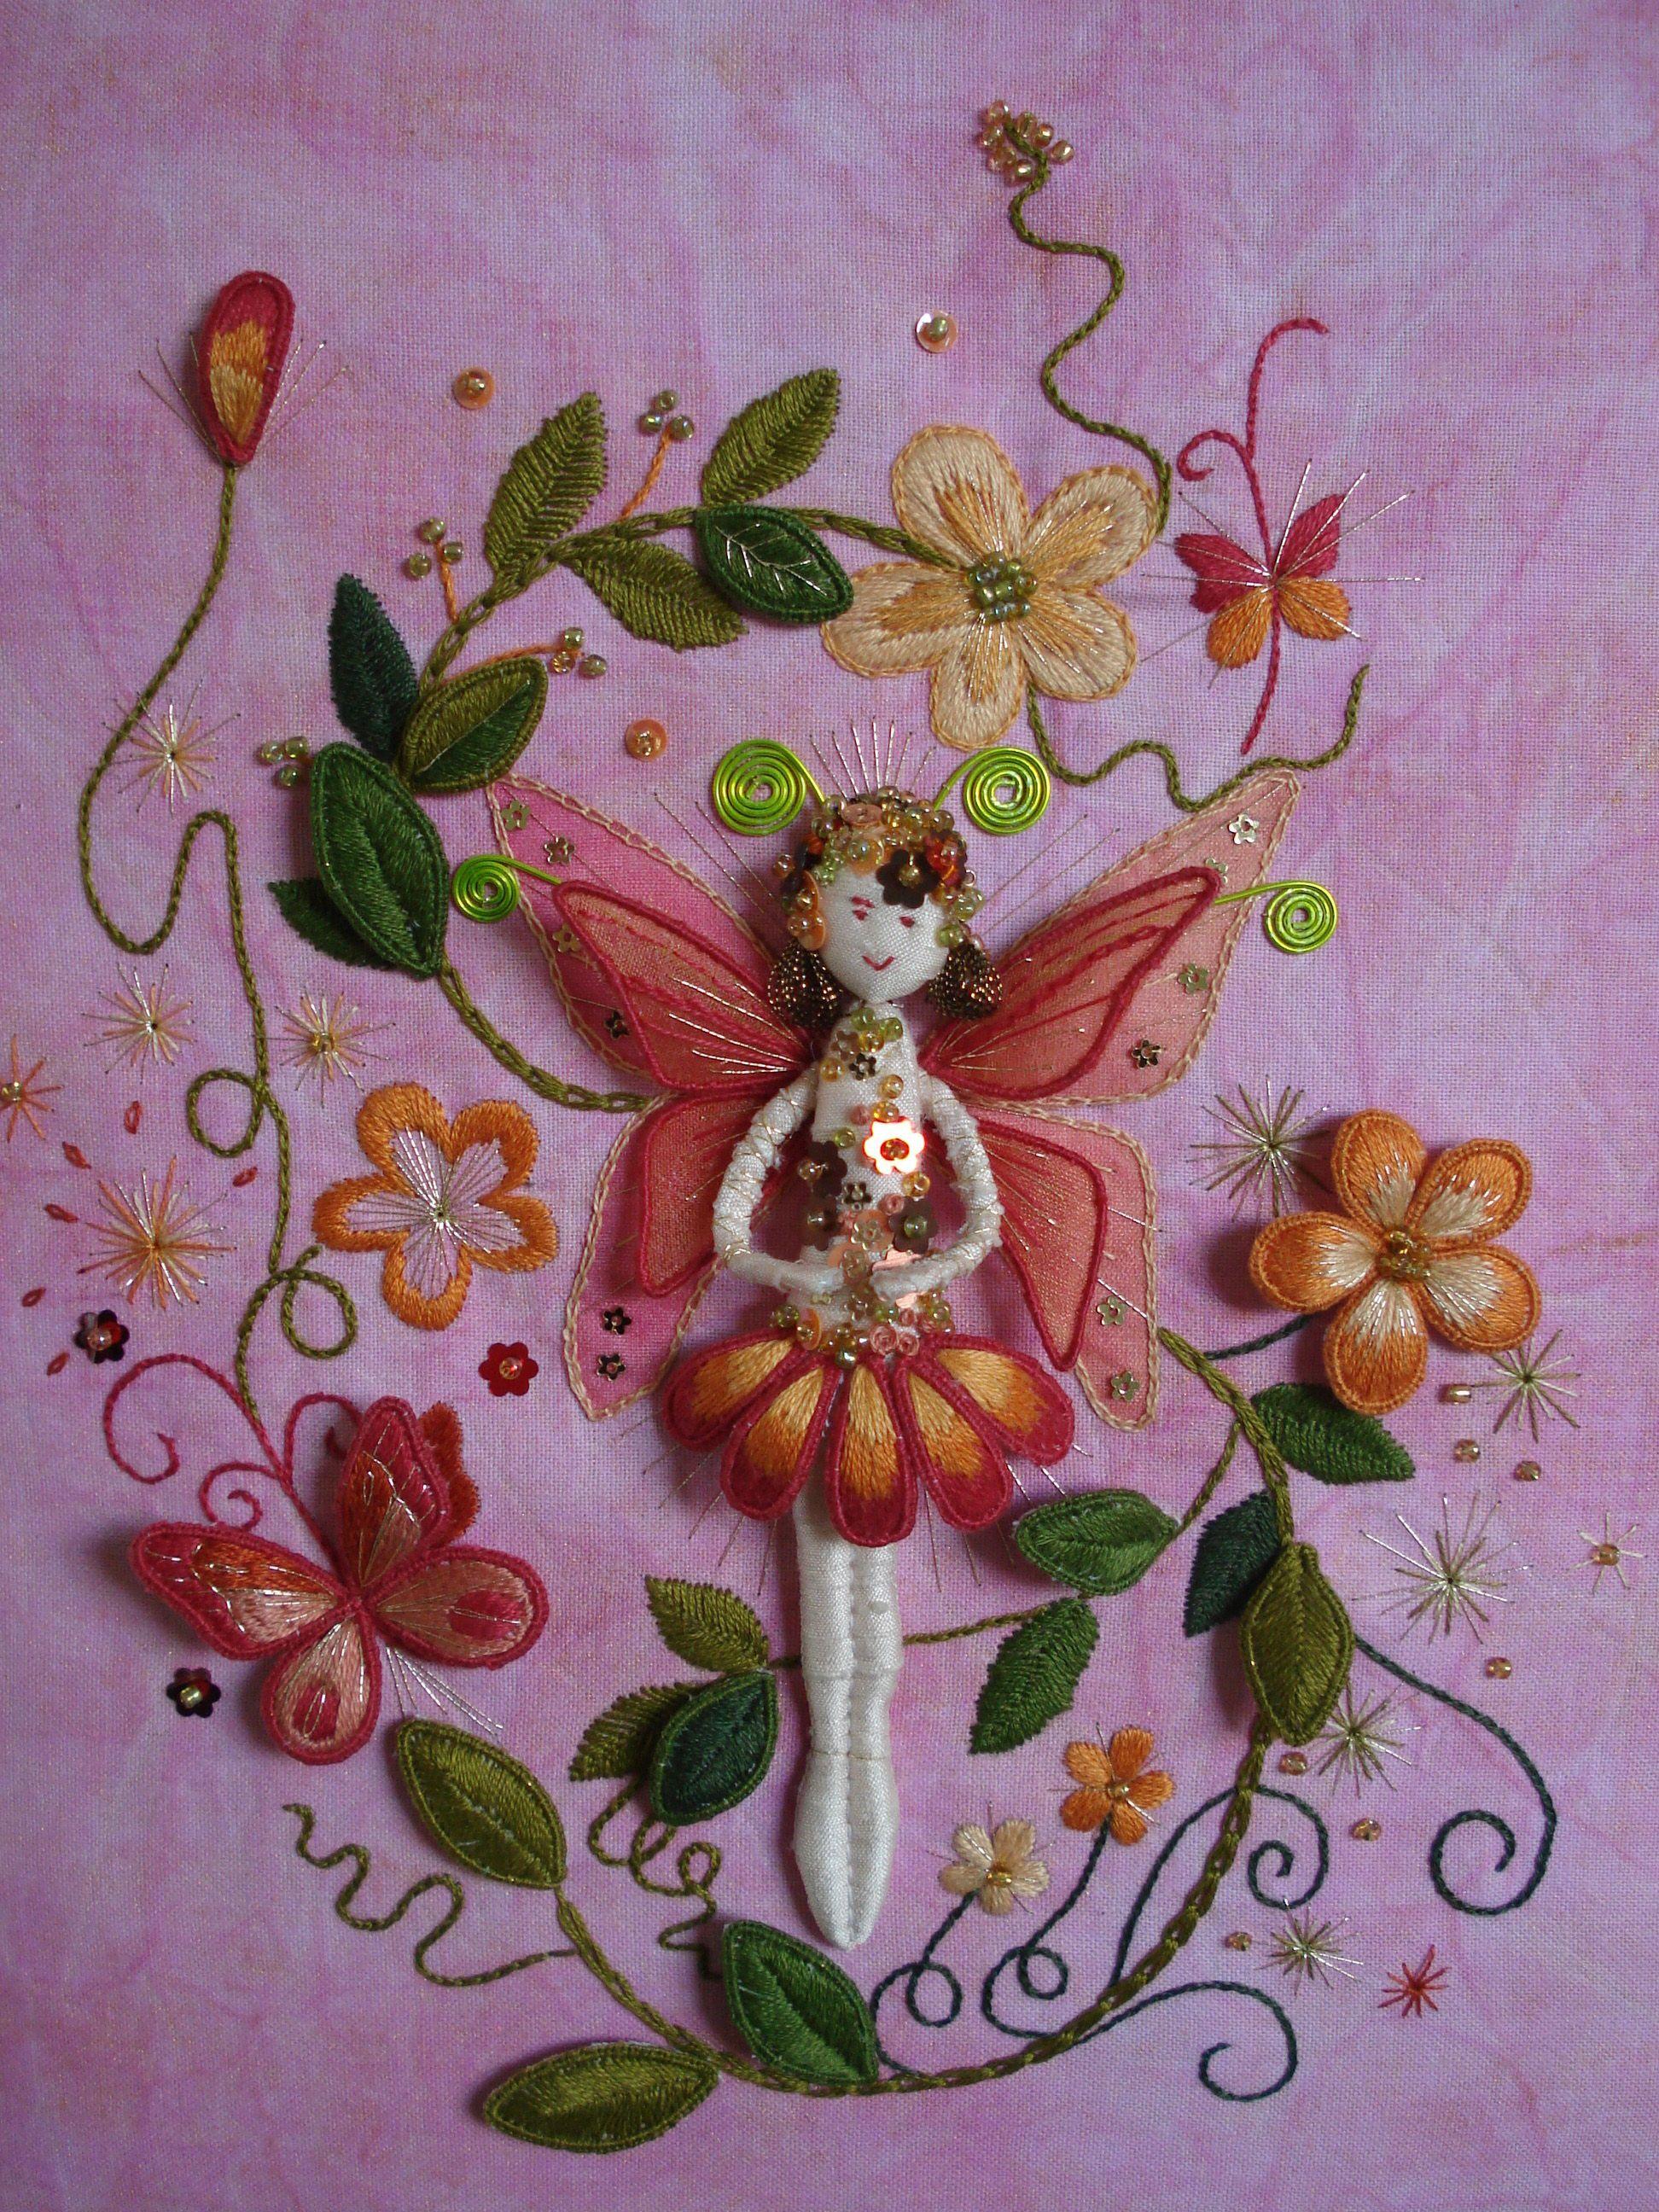 http://www.kathleenlaurelsage.com/images/stump-work/fairy.jpg